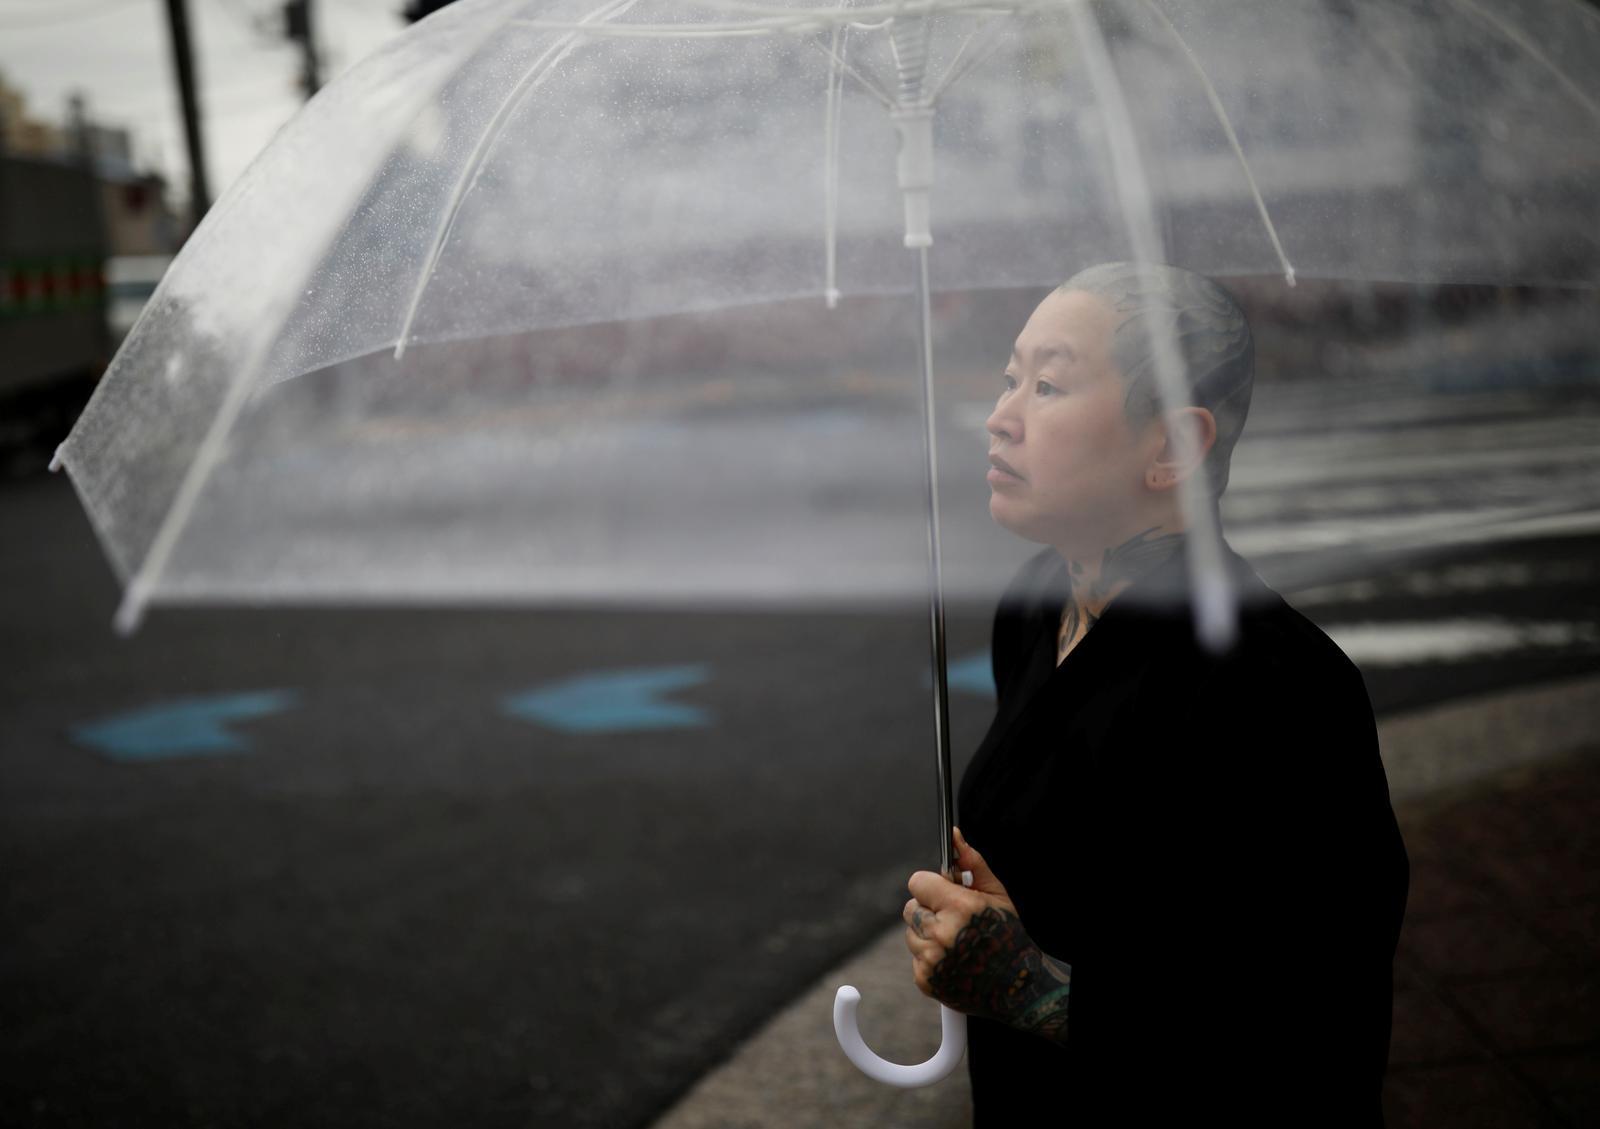 Tattoo artist Shodai Horiren, 52, holds an umbrella as she walks in the rain in Warabi, Saitama Prefecture, Japan, July 3, 2020. Photo: Reuters